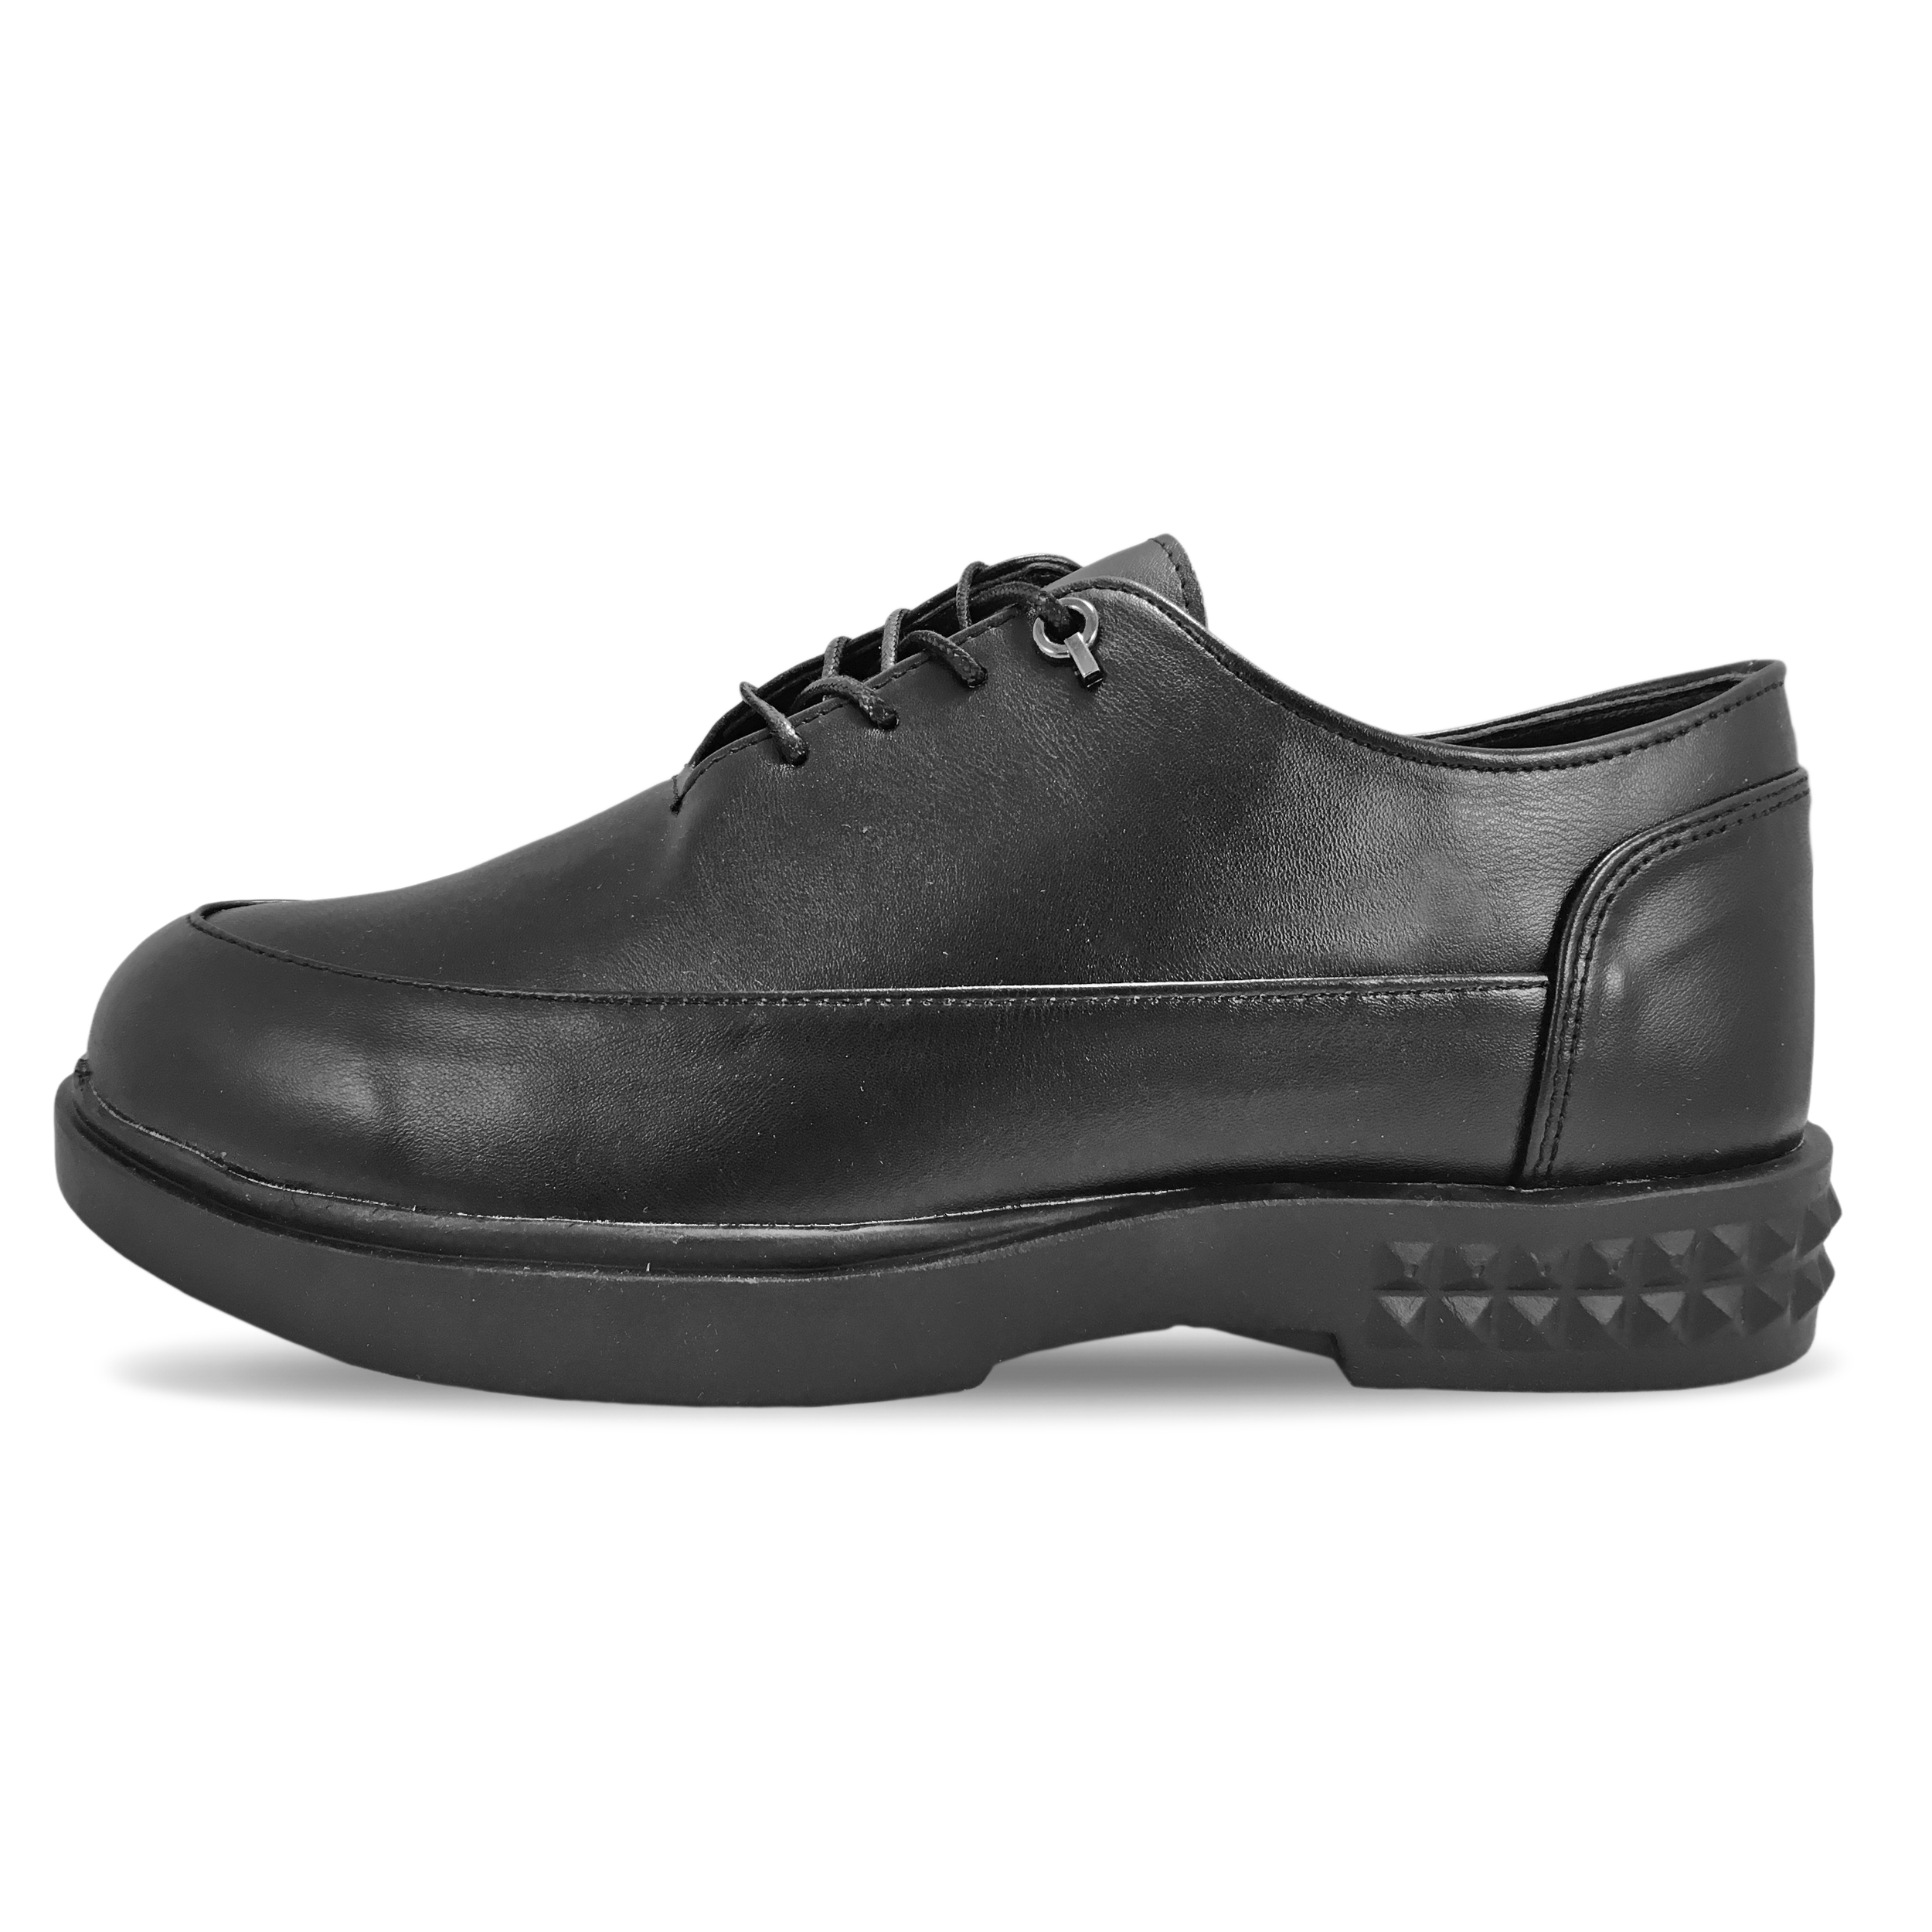 کفش مردانه مدل روبرتو کد 3455